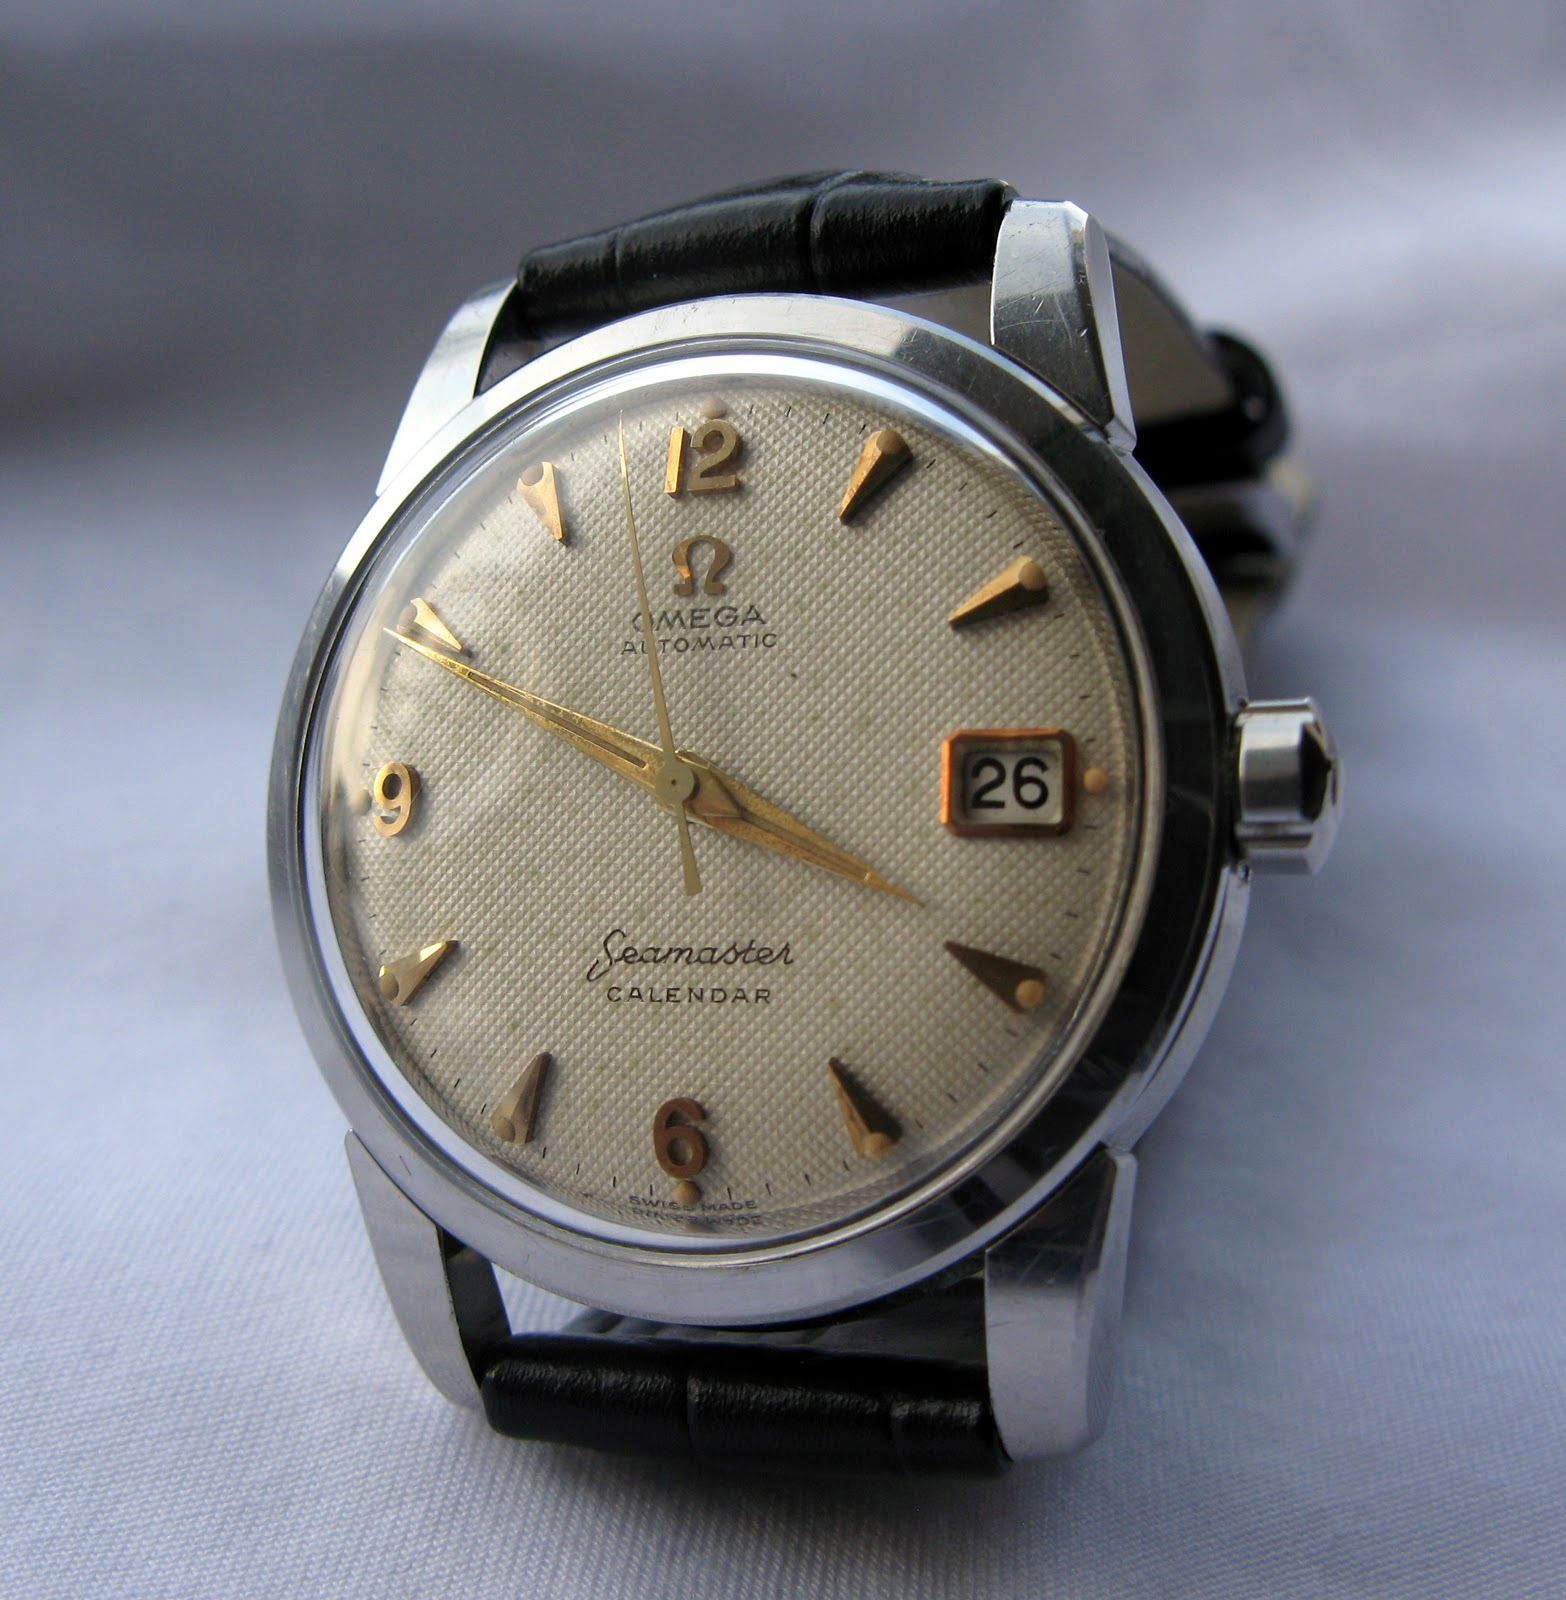 Omega Seamaster Calendar Vintage : Andy b vintage watches omega seamaster calendar cal